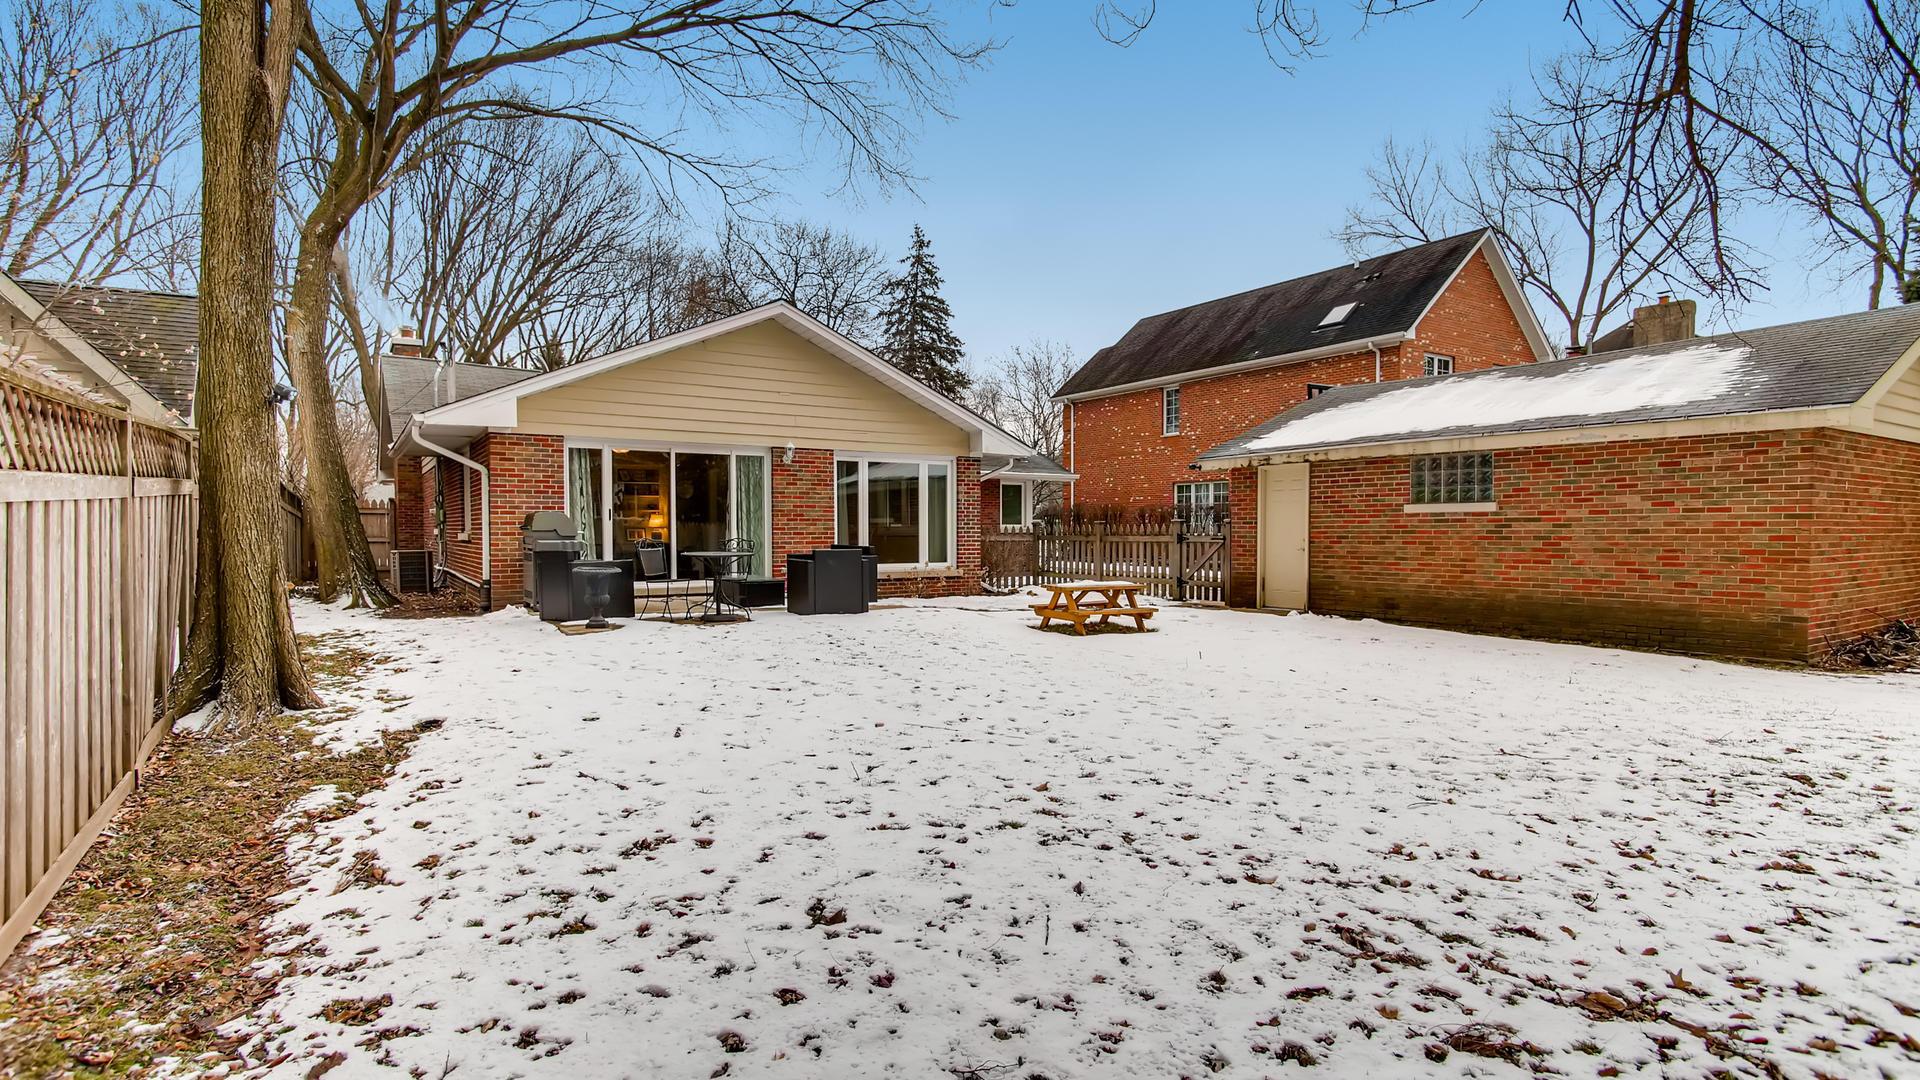 736 North OAK, Hinsdale, Illinois, 60521